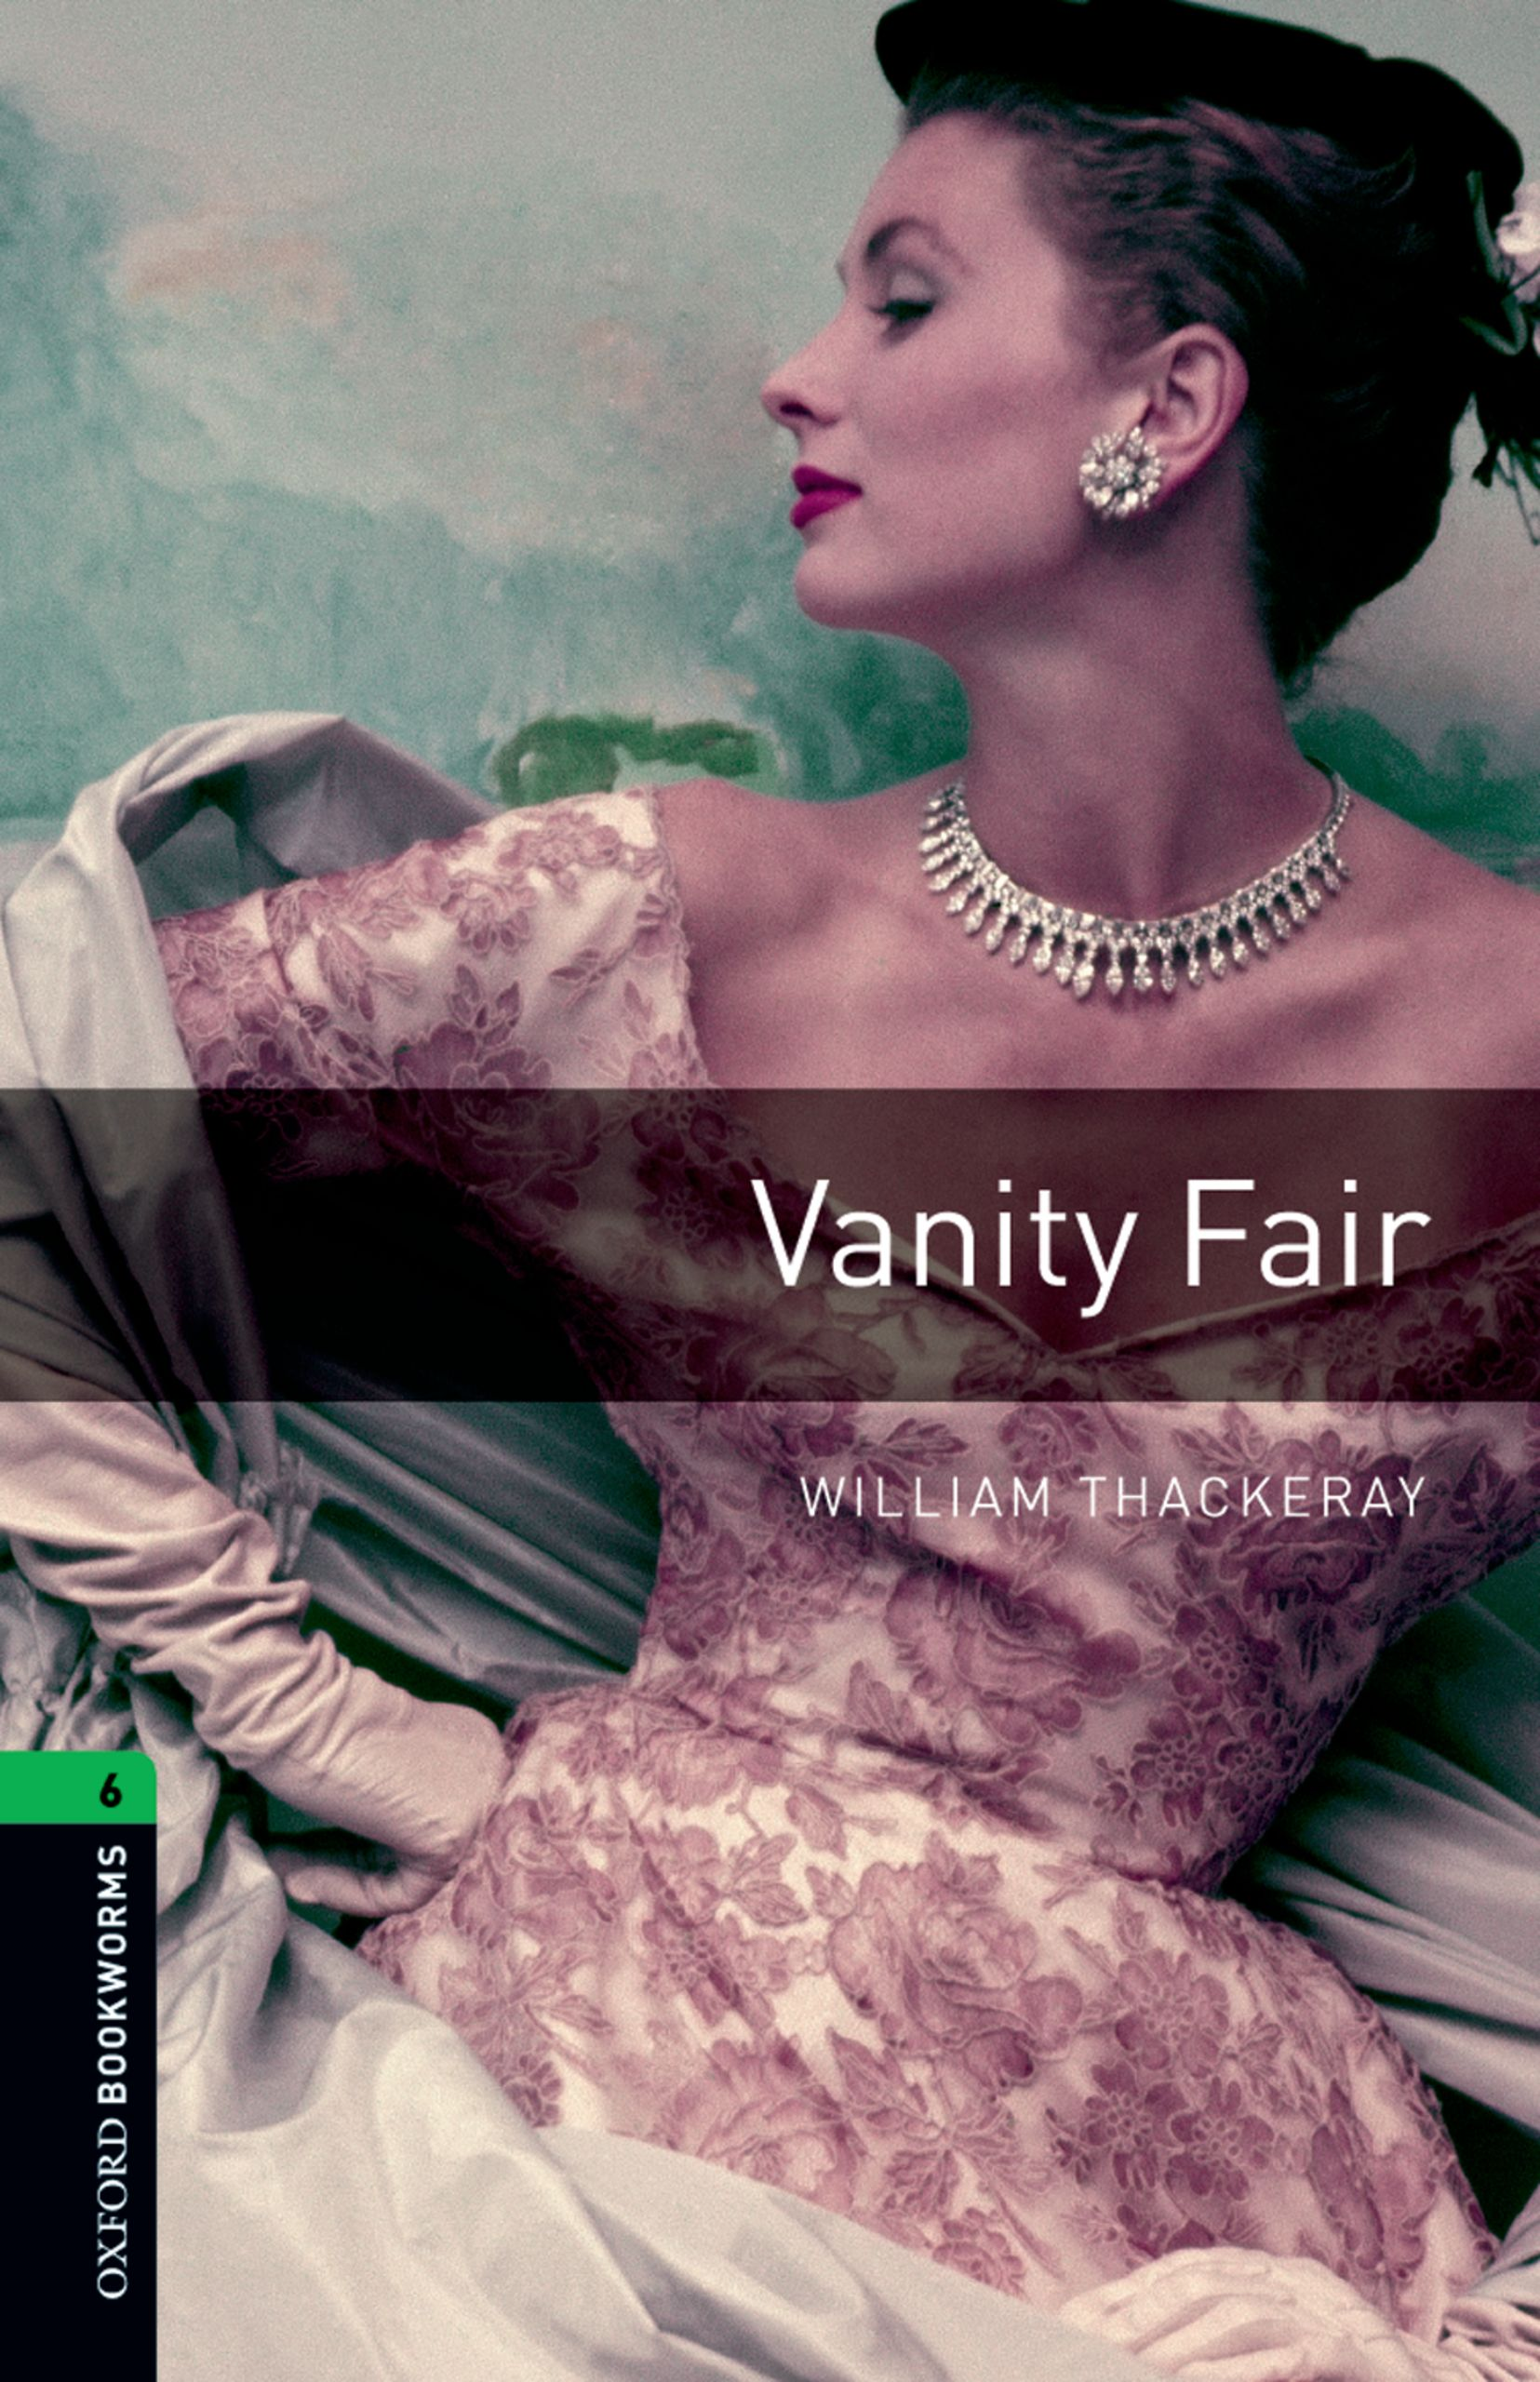 Уильям Мейкпис Теккерей Vanity Fair becky wicks tempted by her hot shot doc